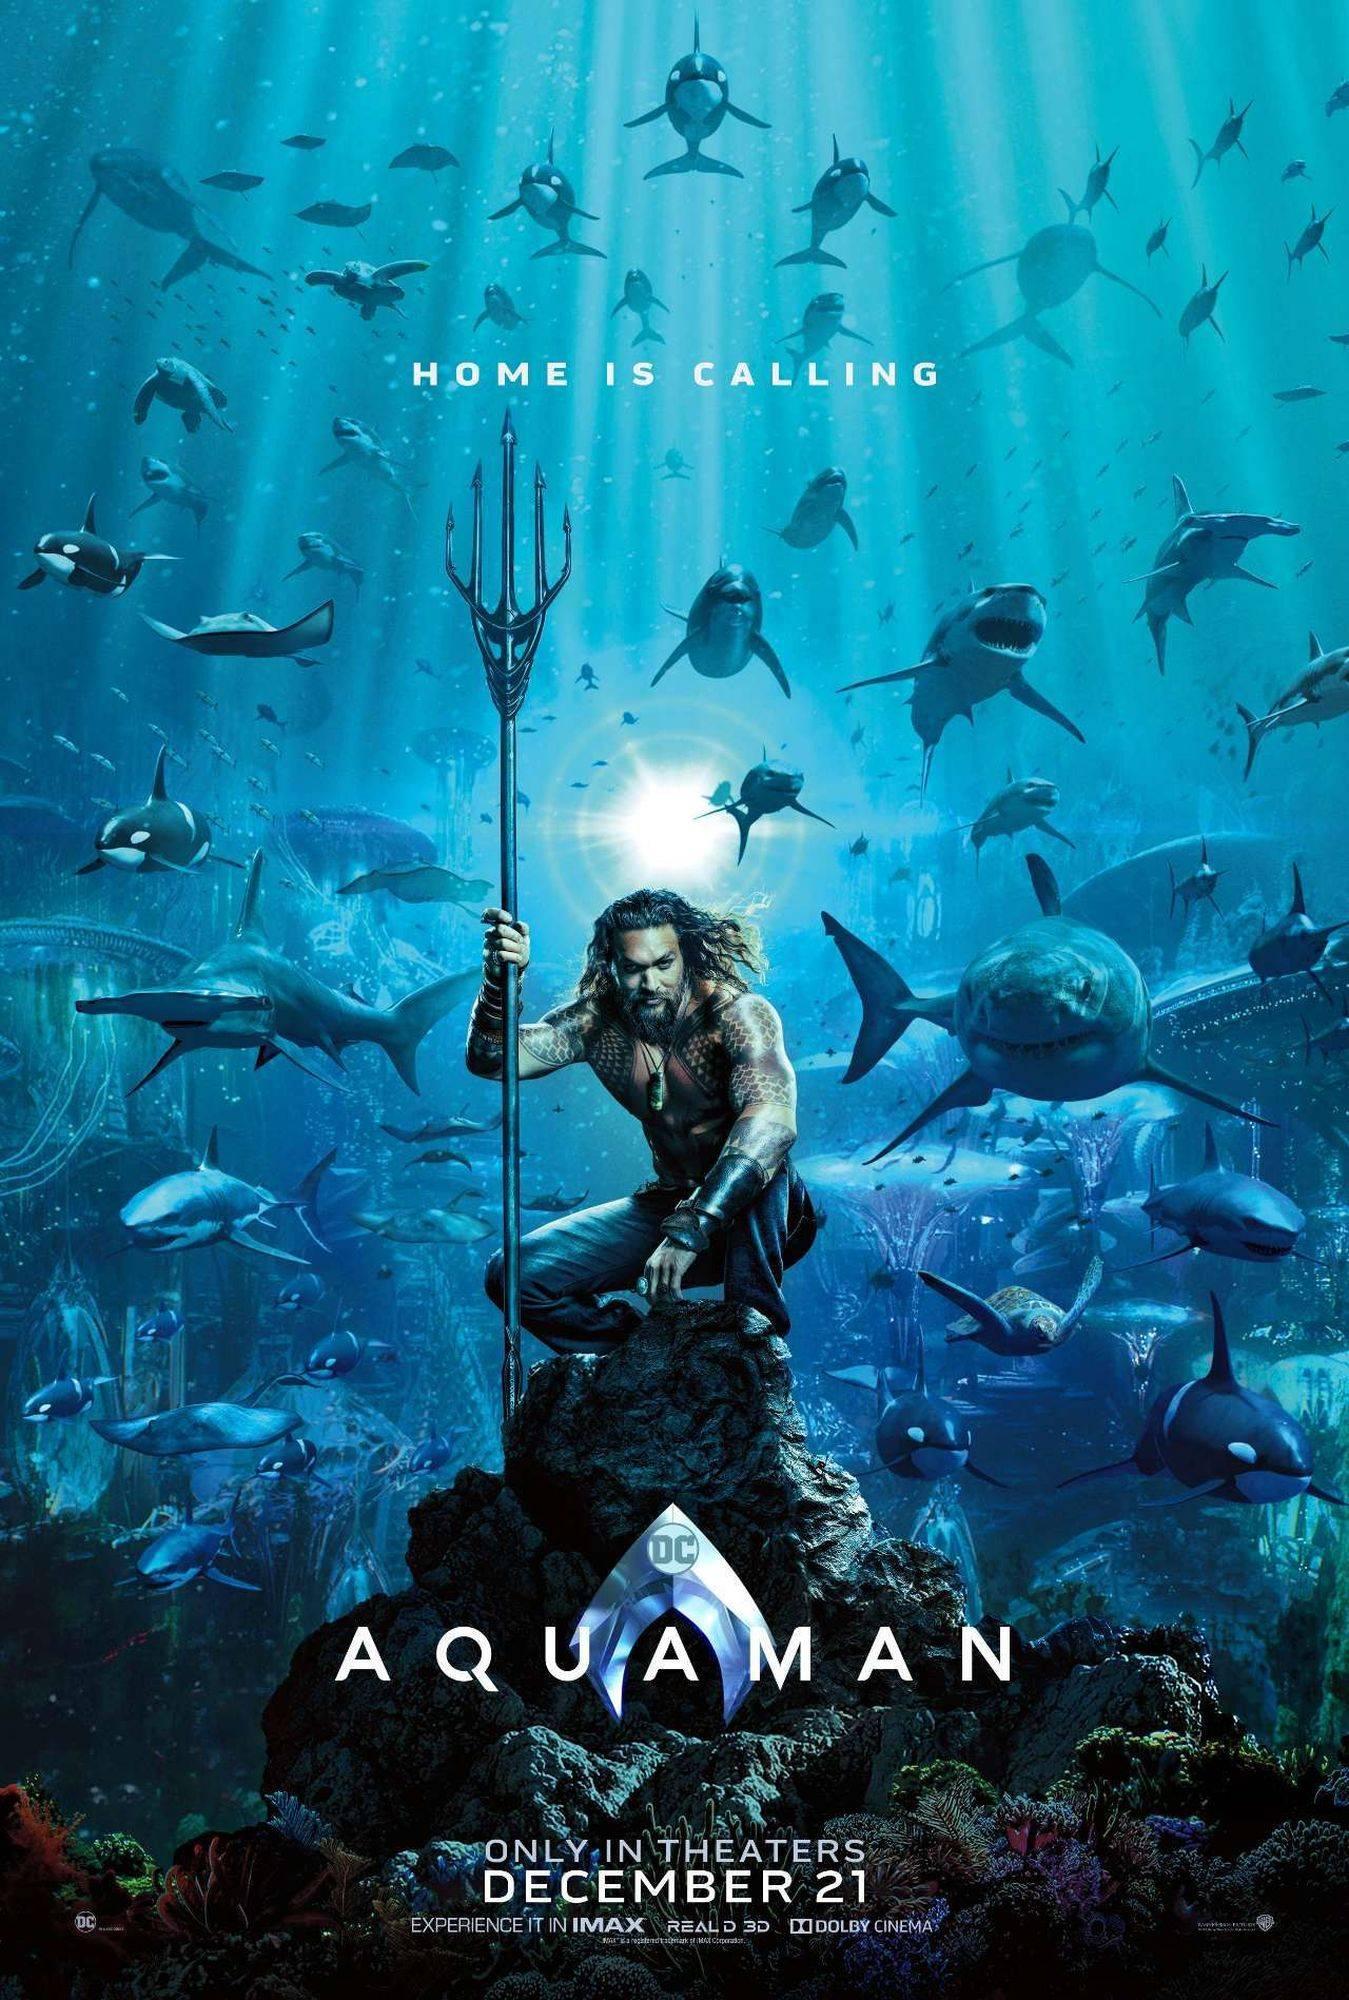 Photo of Lanzan el poster oficial de la película 'Aquaman'